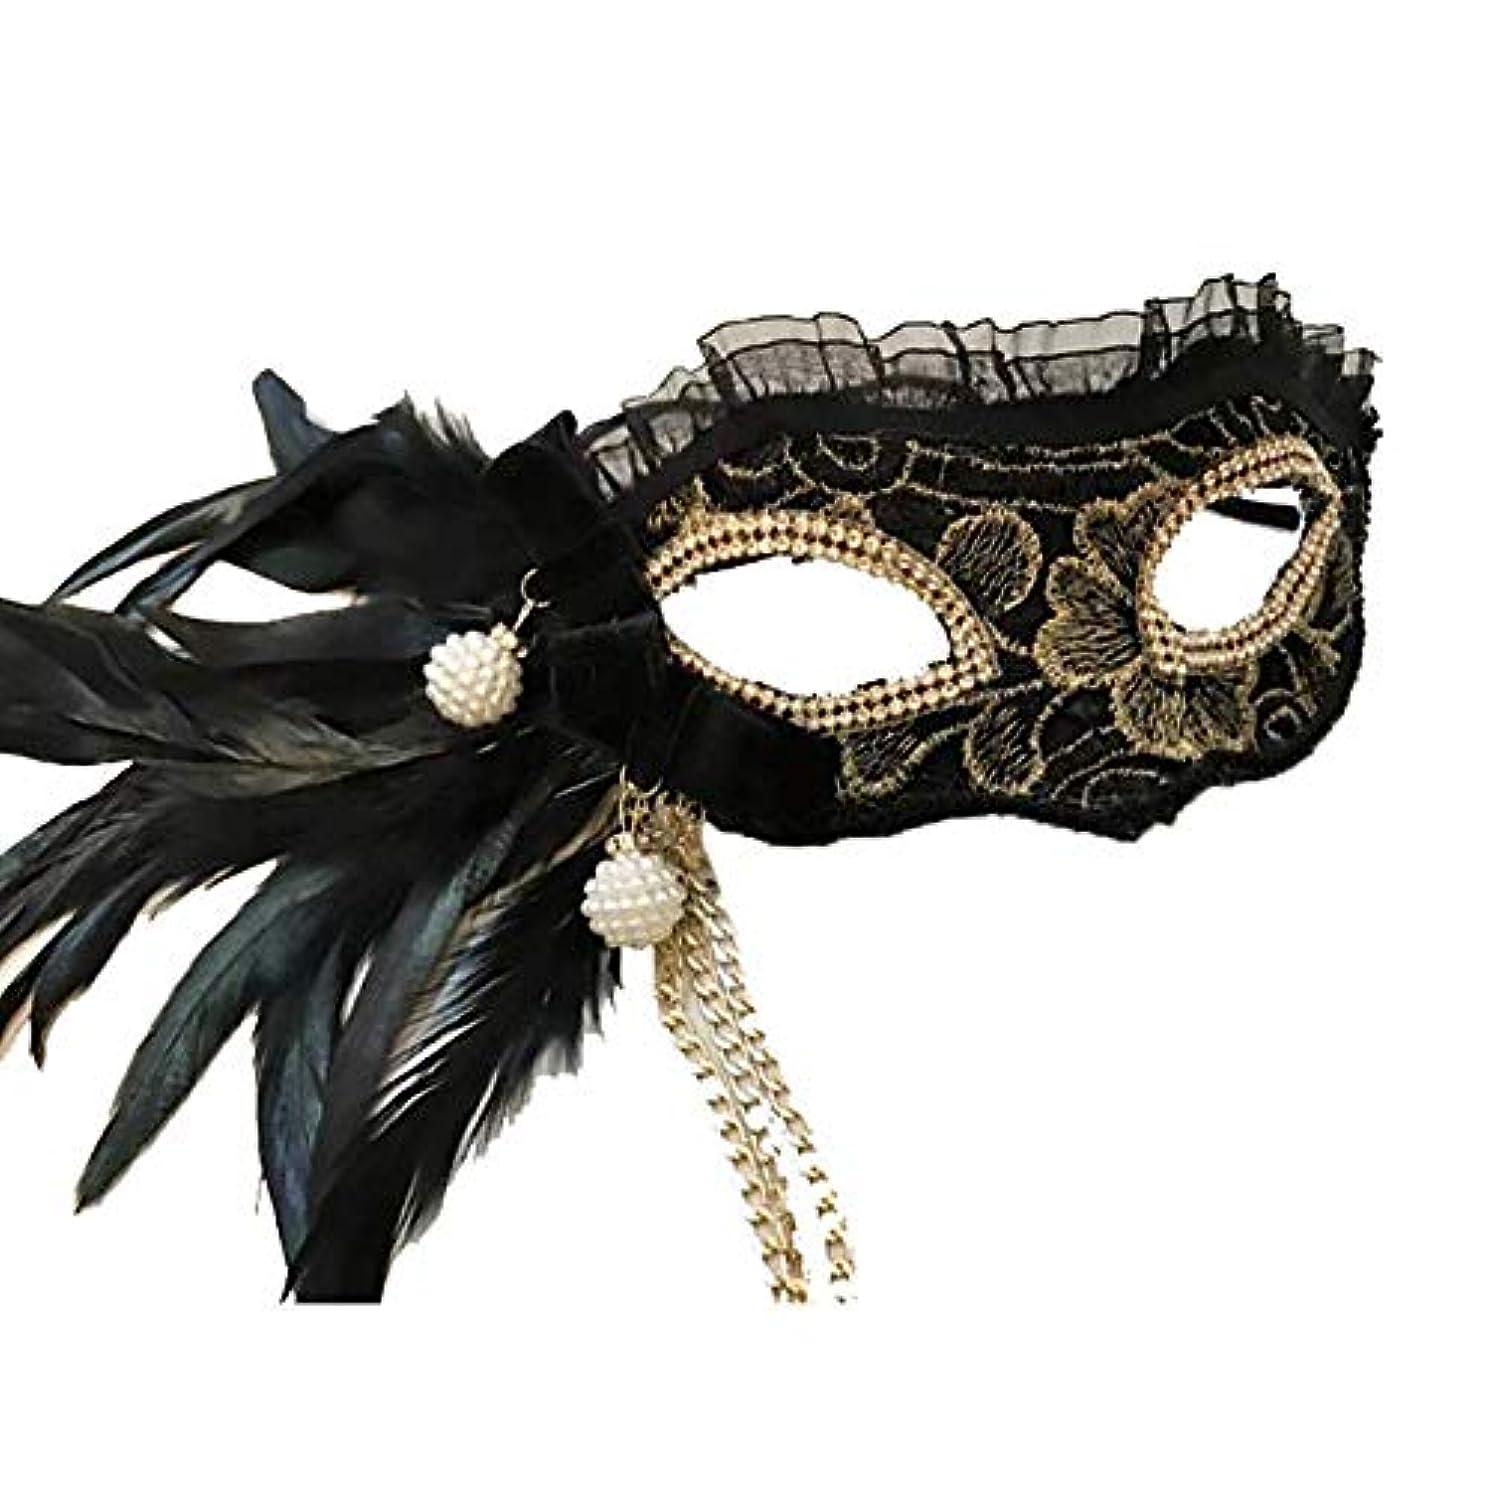 Nanle ハロウィンクリスマスフェザー刺繍フリンジフラワービーズマスク仮装マスクレディミスプリンセス美容祭パーティーデコレーションマスク (色 : Style A)